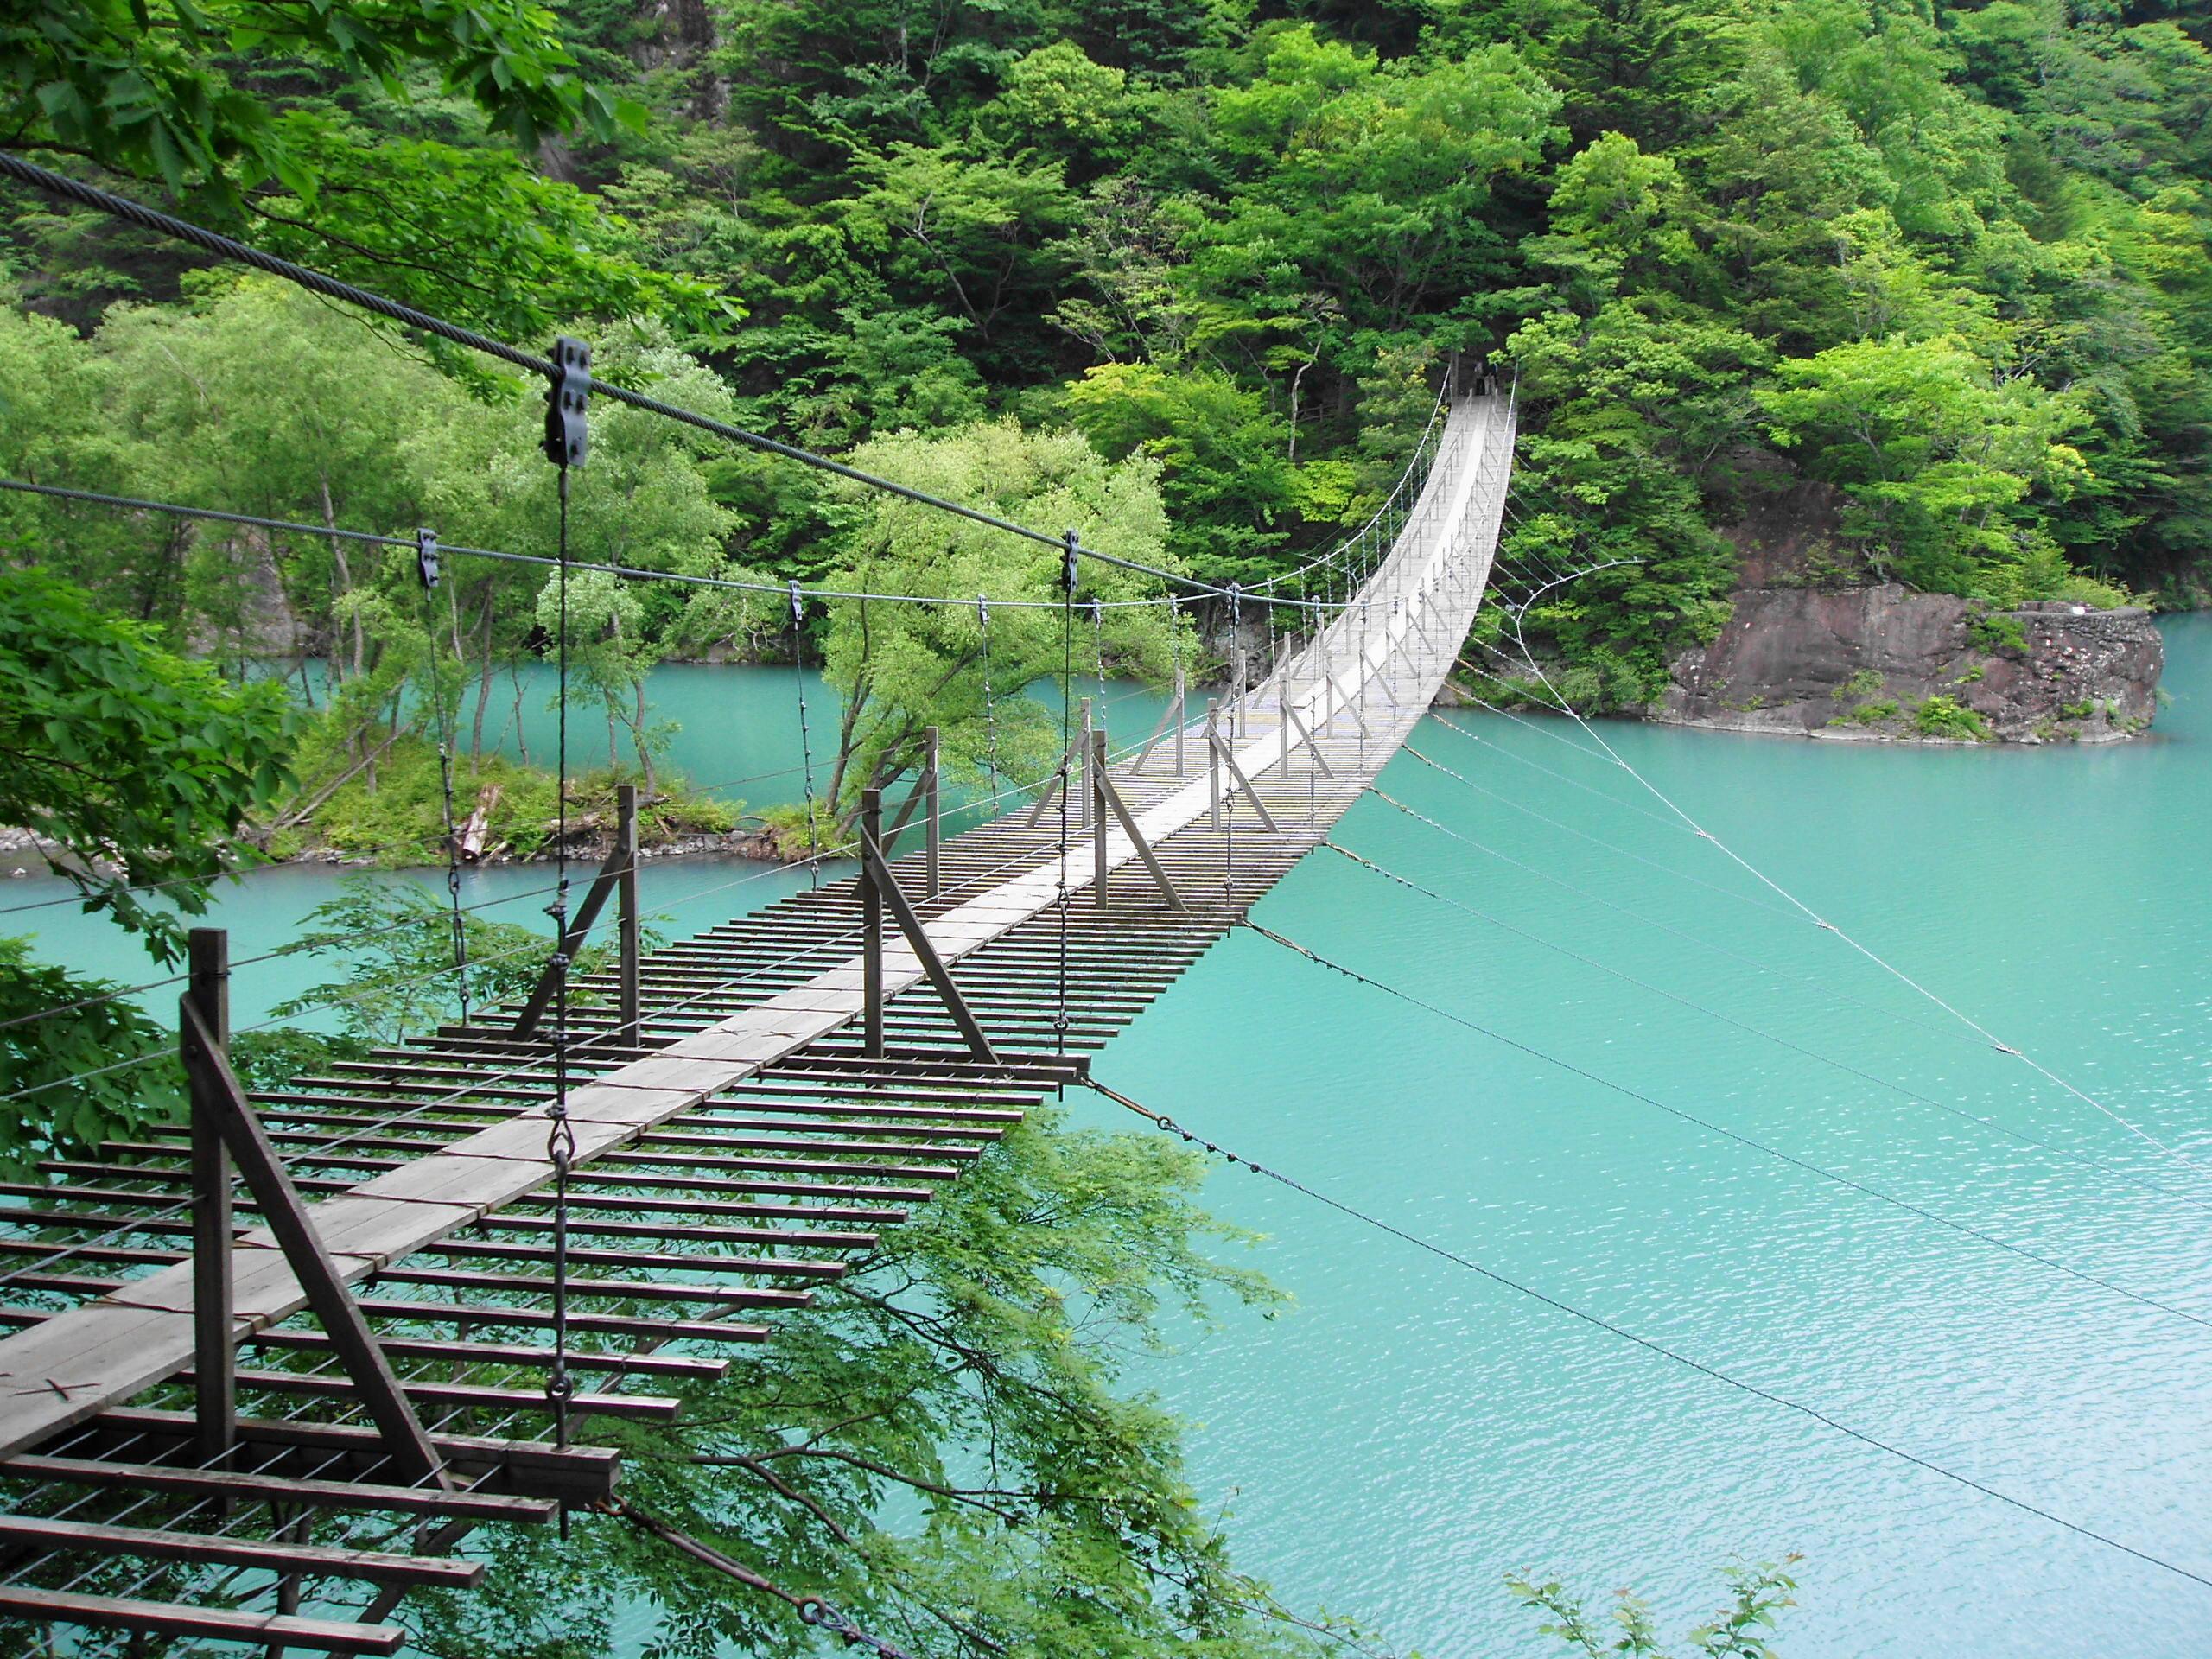 HARIBOの日記 寸又峡温泉を訪れ、夢の吊り橋を渡る